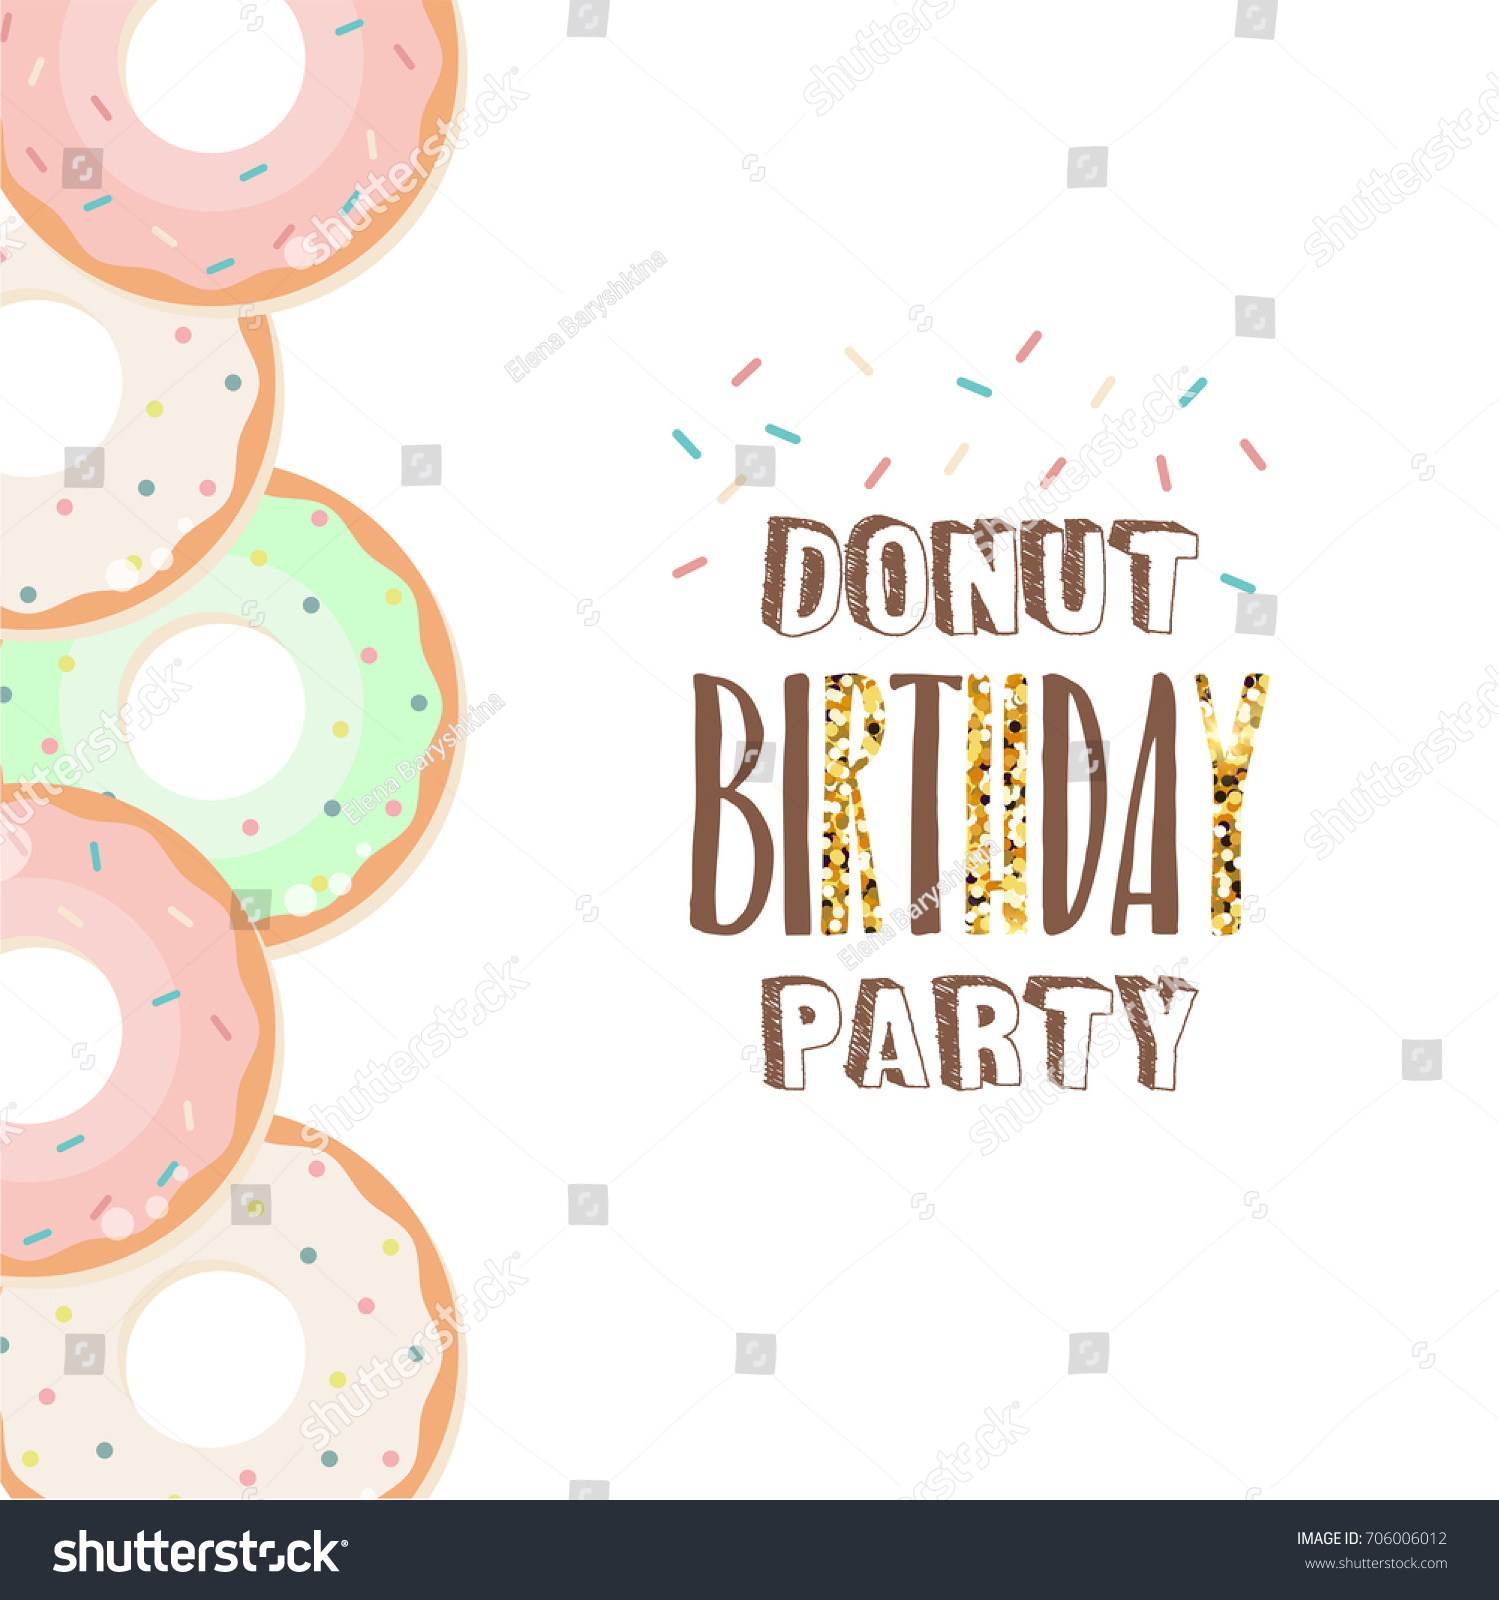 Royalty Free Stock Illustration of Donut Birthday Party Invitation ...